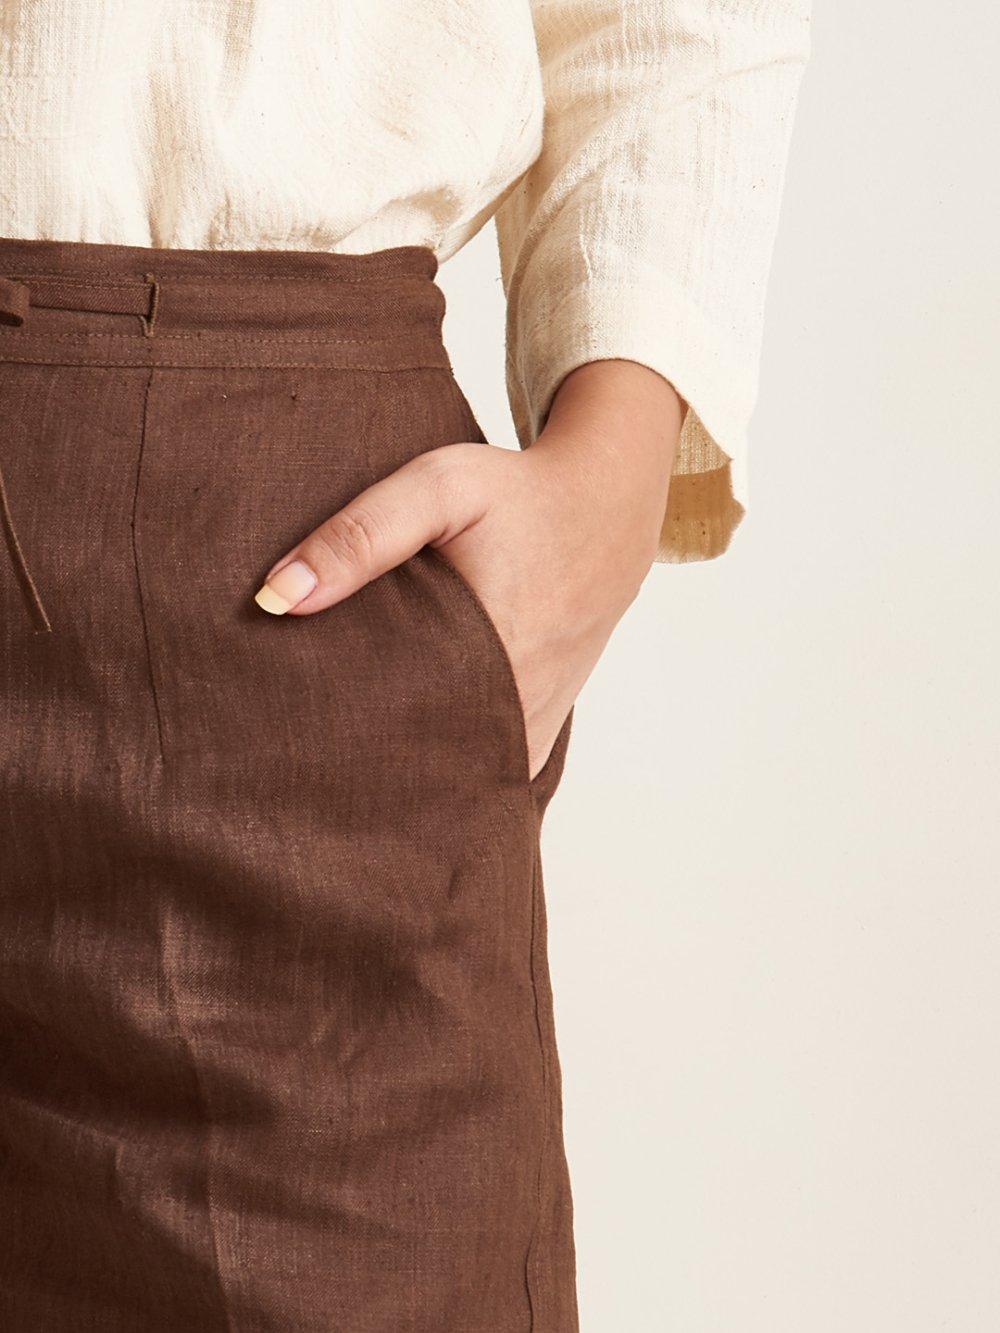 patrah.com Organic Clothing Linen